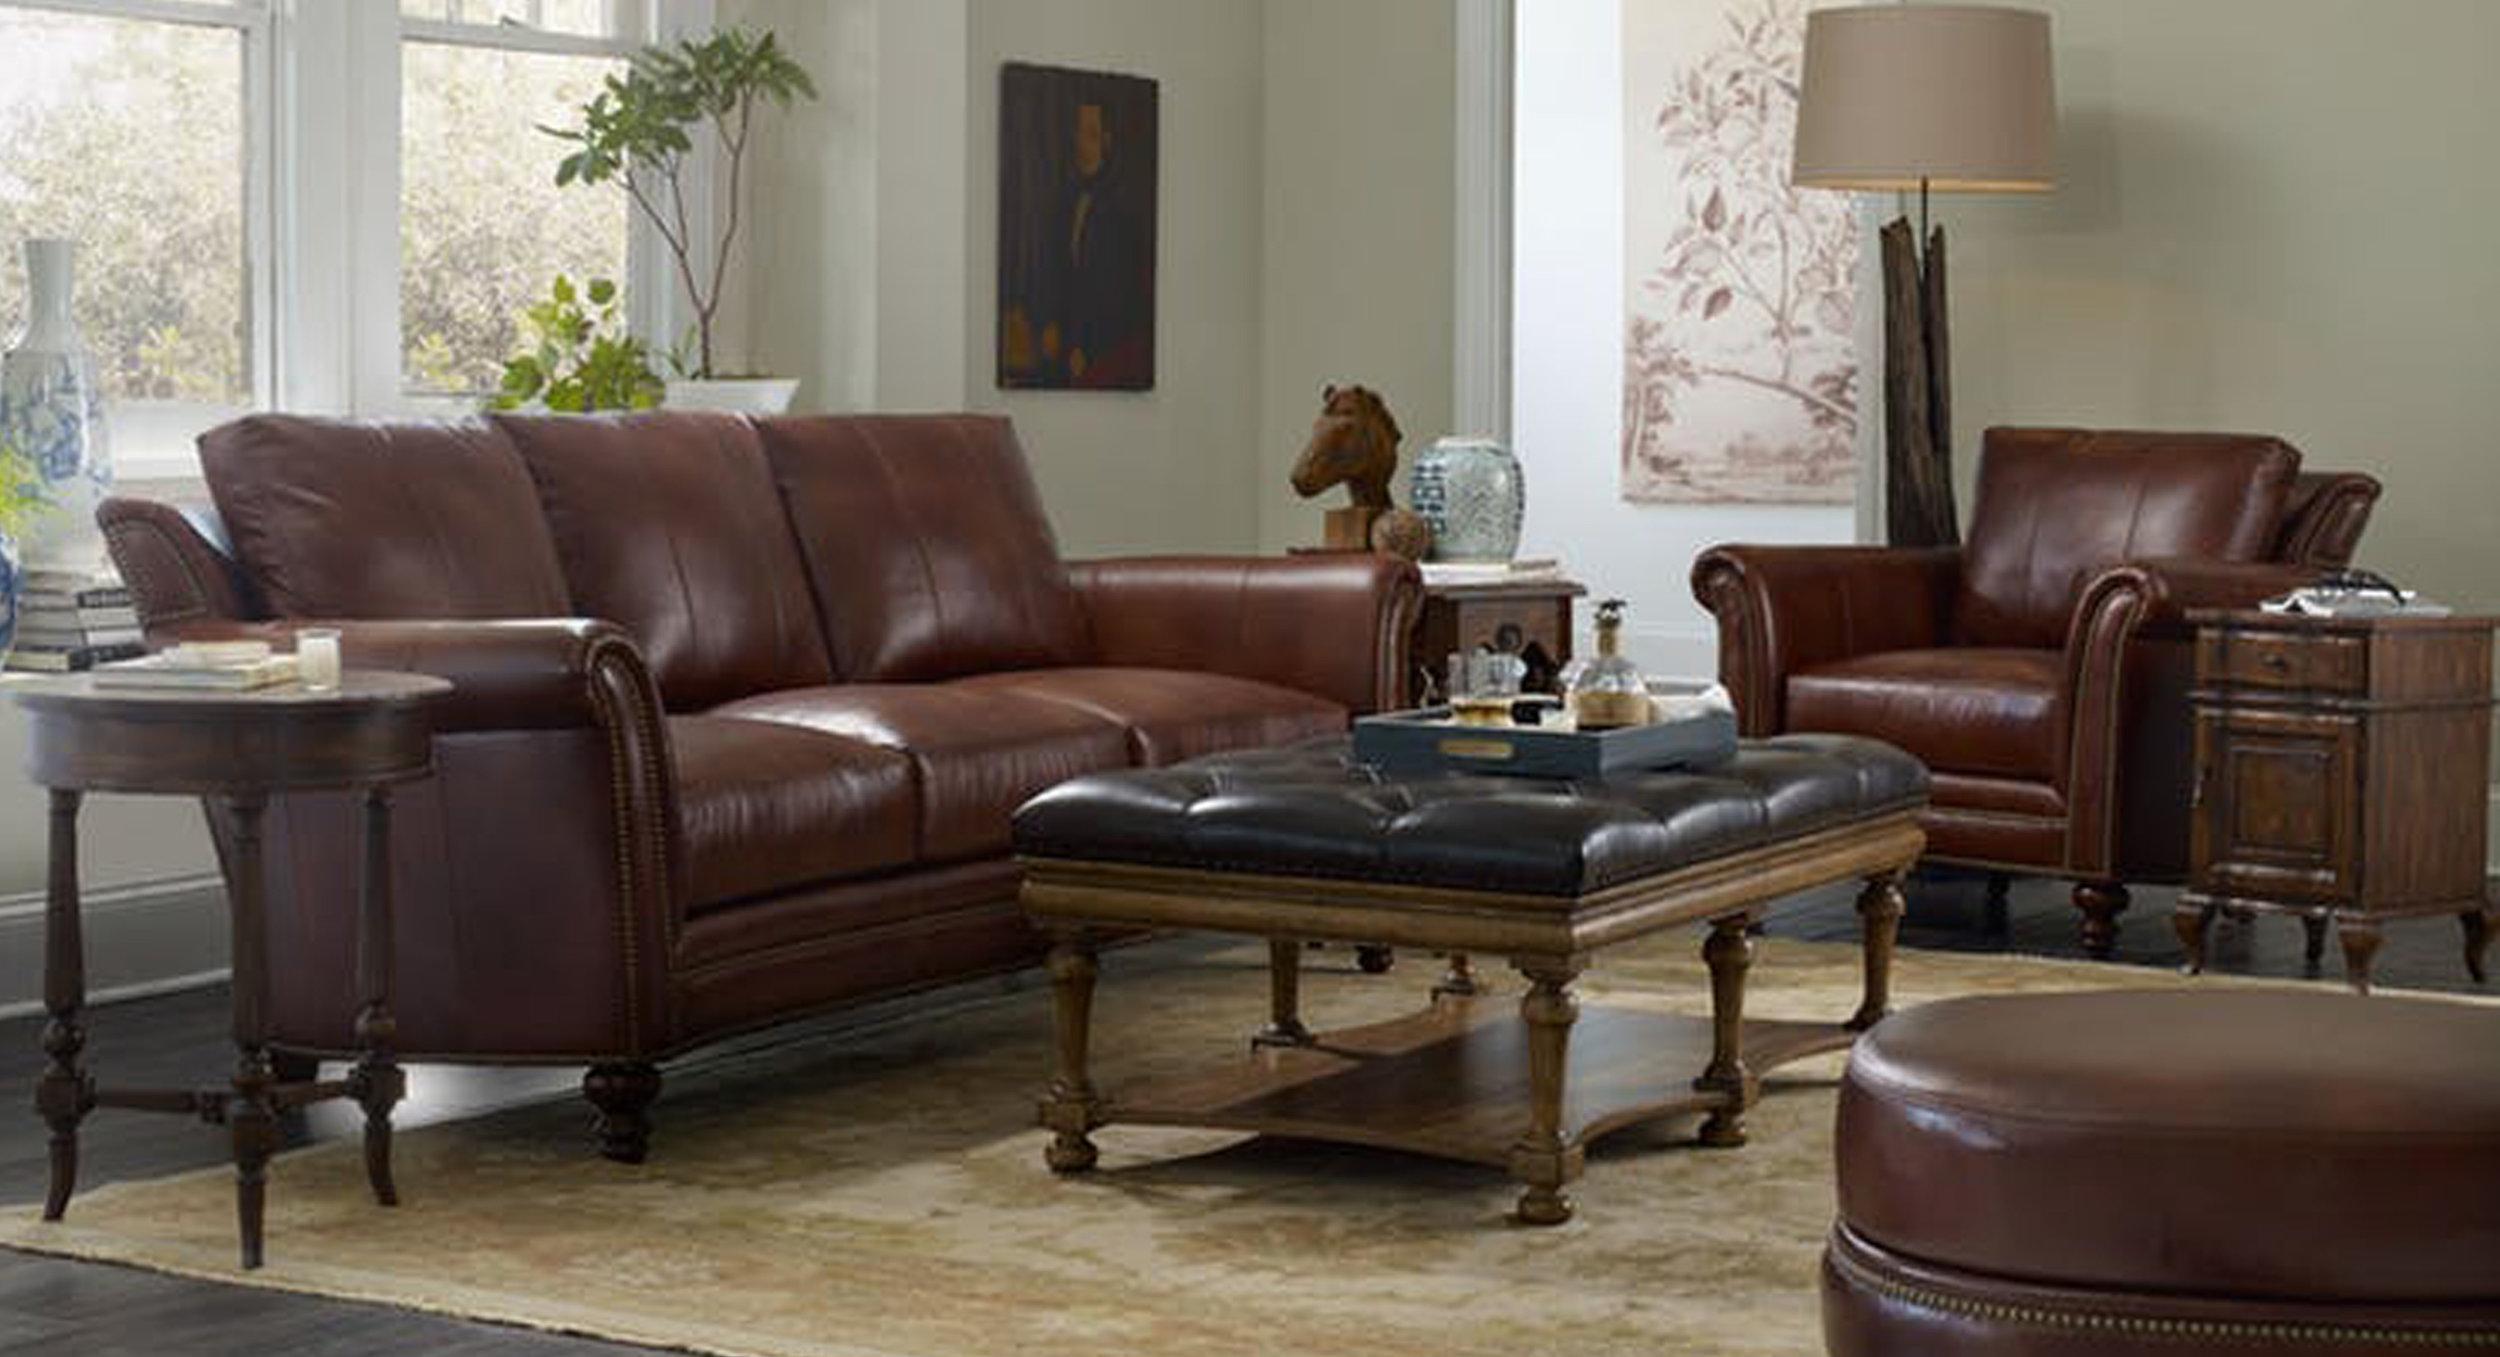 Bakers_Home_Furnishings_Leather.jpg